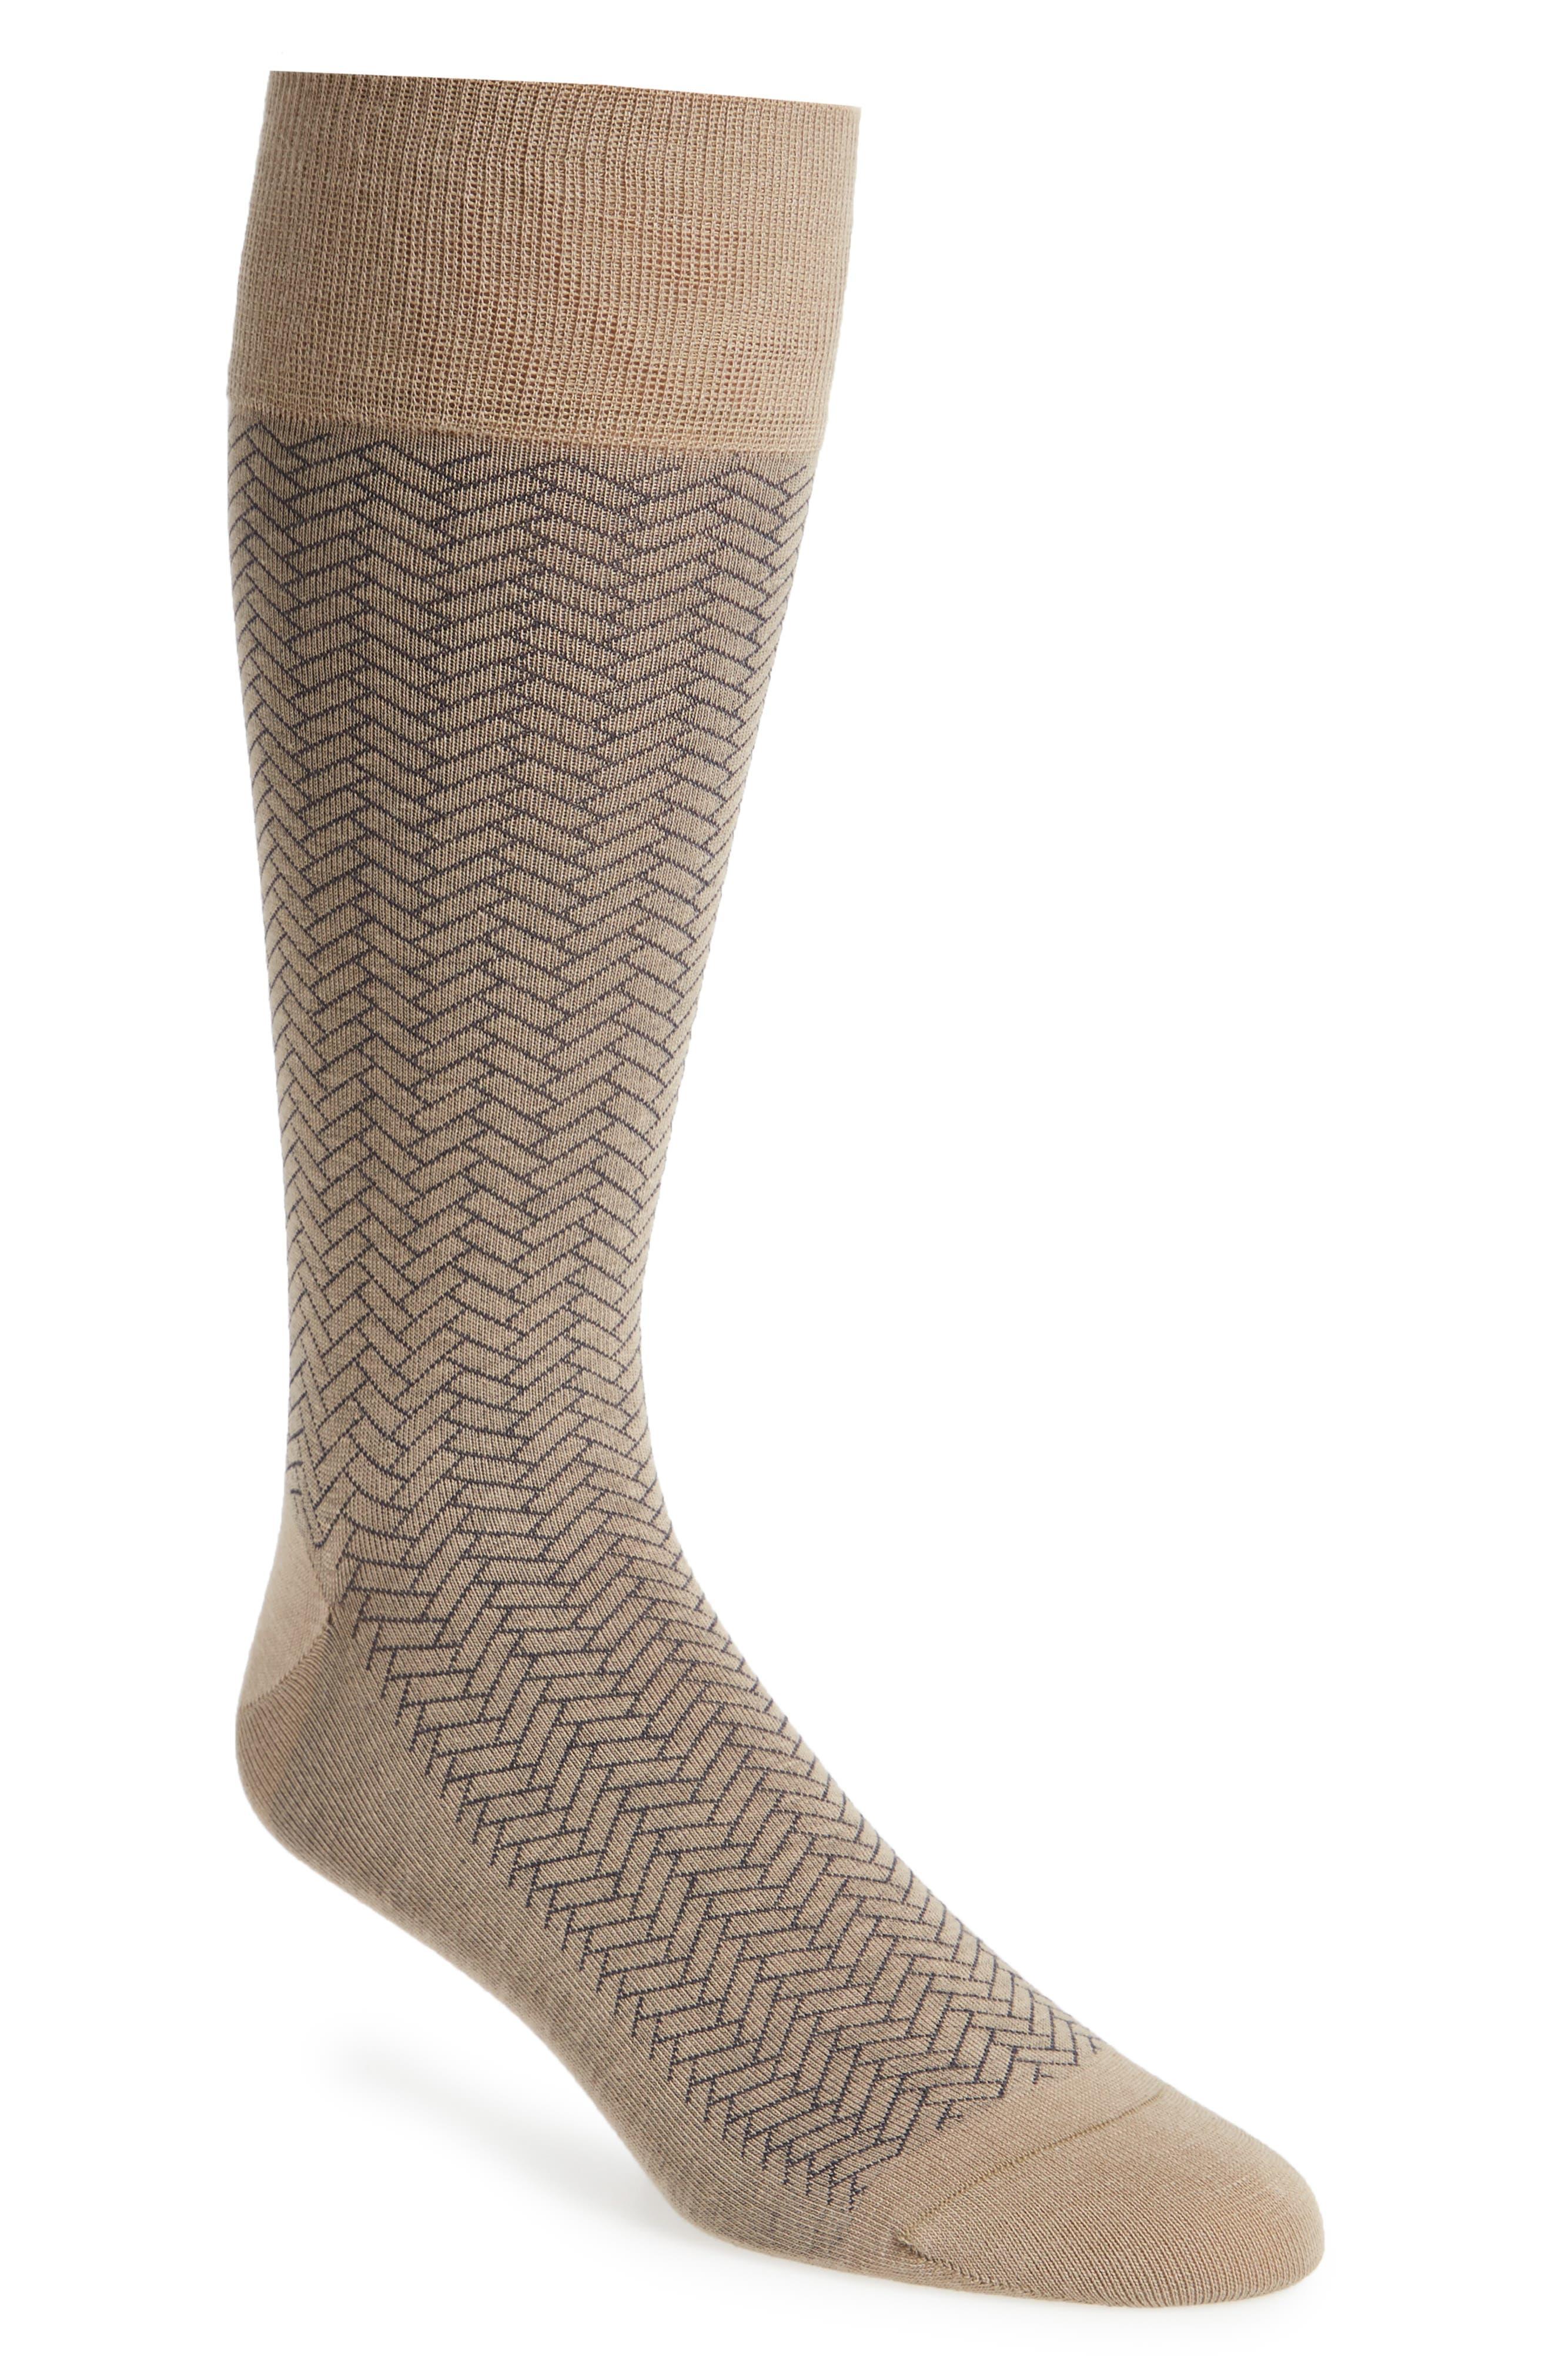 Alternate Image 1 Selected - Cole Haan Geometric Crew Socks (3 for $30)